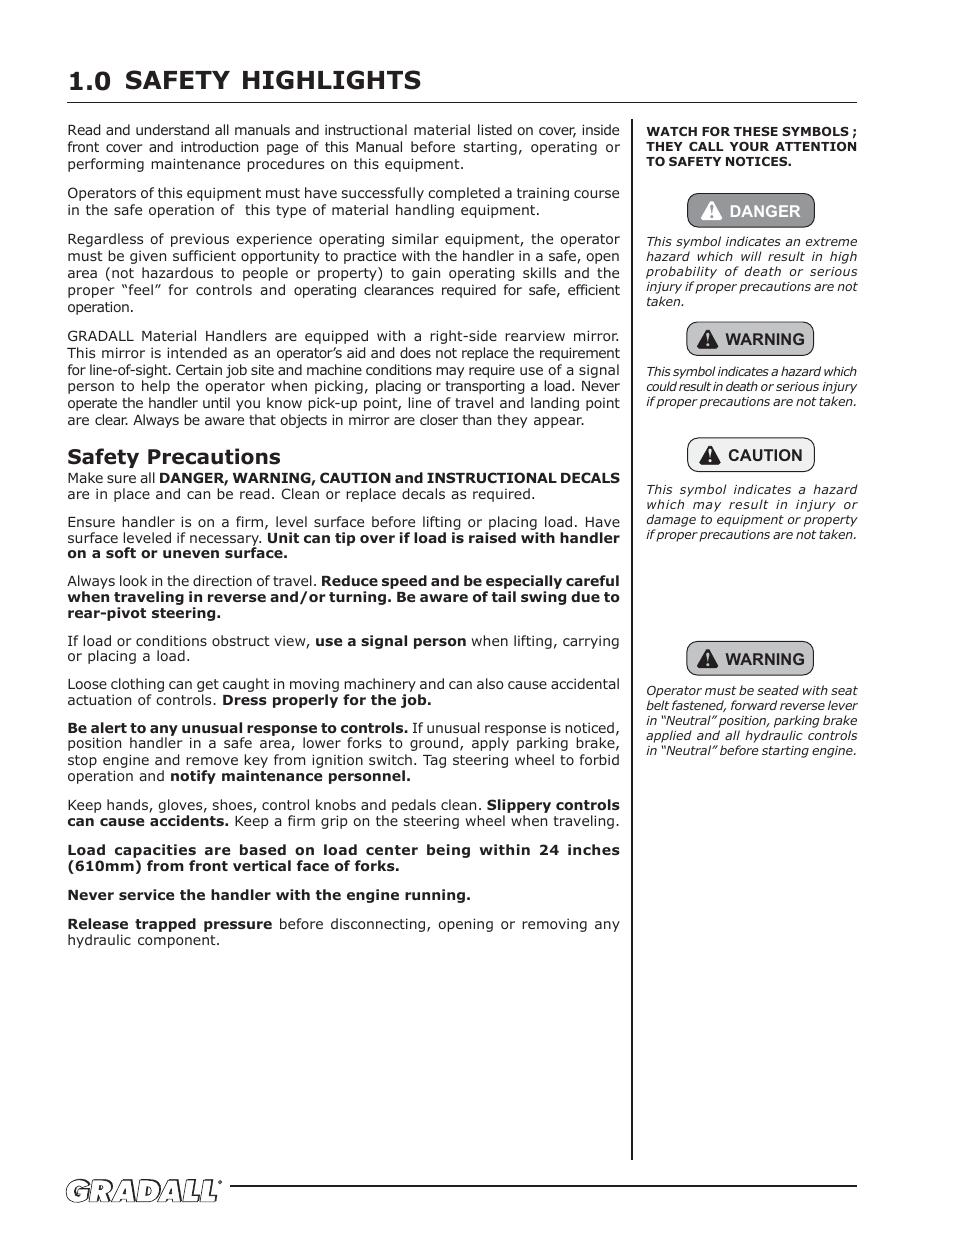 safety highlights safety precautions gradall 534d 10 9134 4052 rh manualsdir com Nakamichi Mini Speaker Manual Legal Practice Manuals